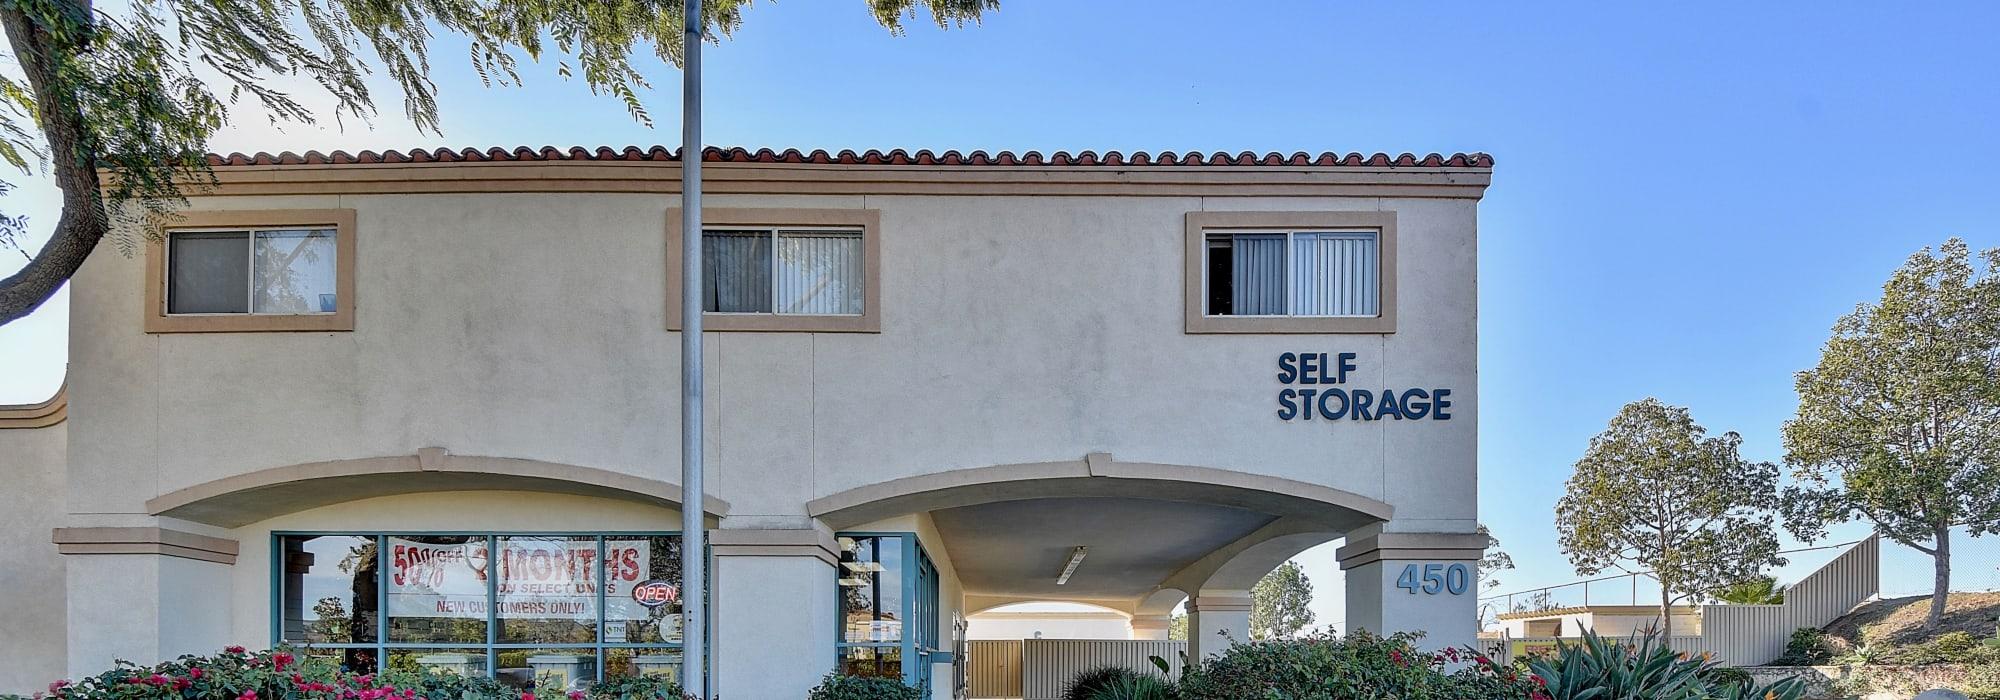 My Self Storage Space in Camarillo, California